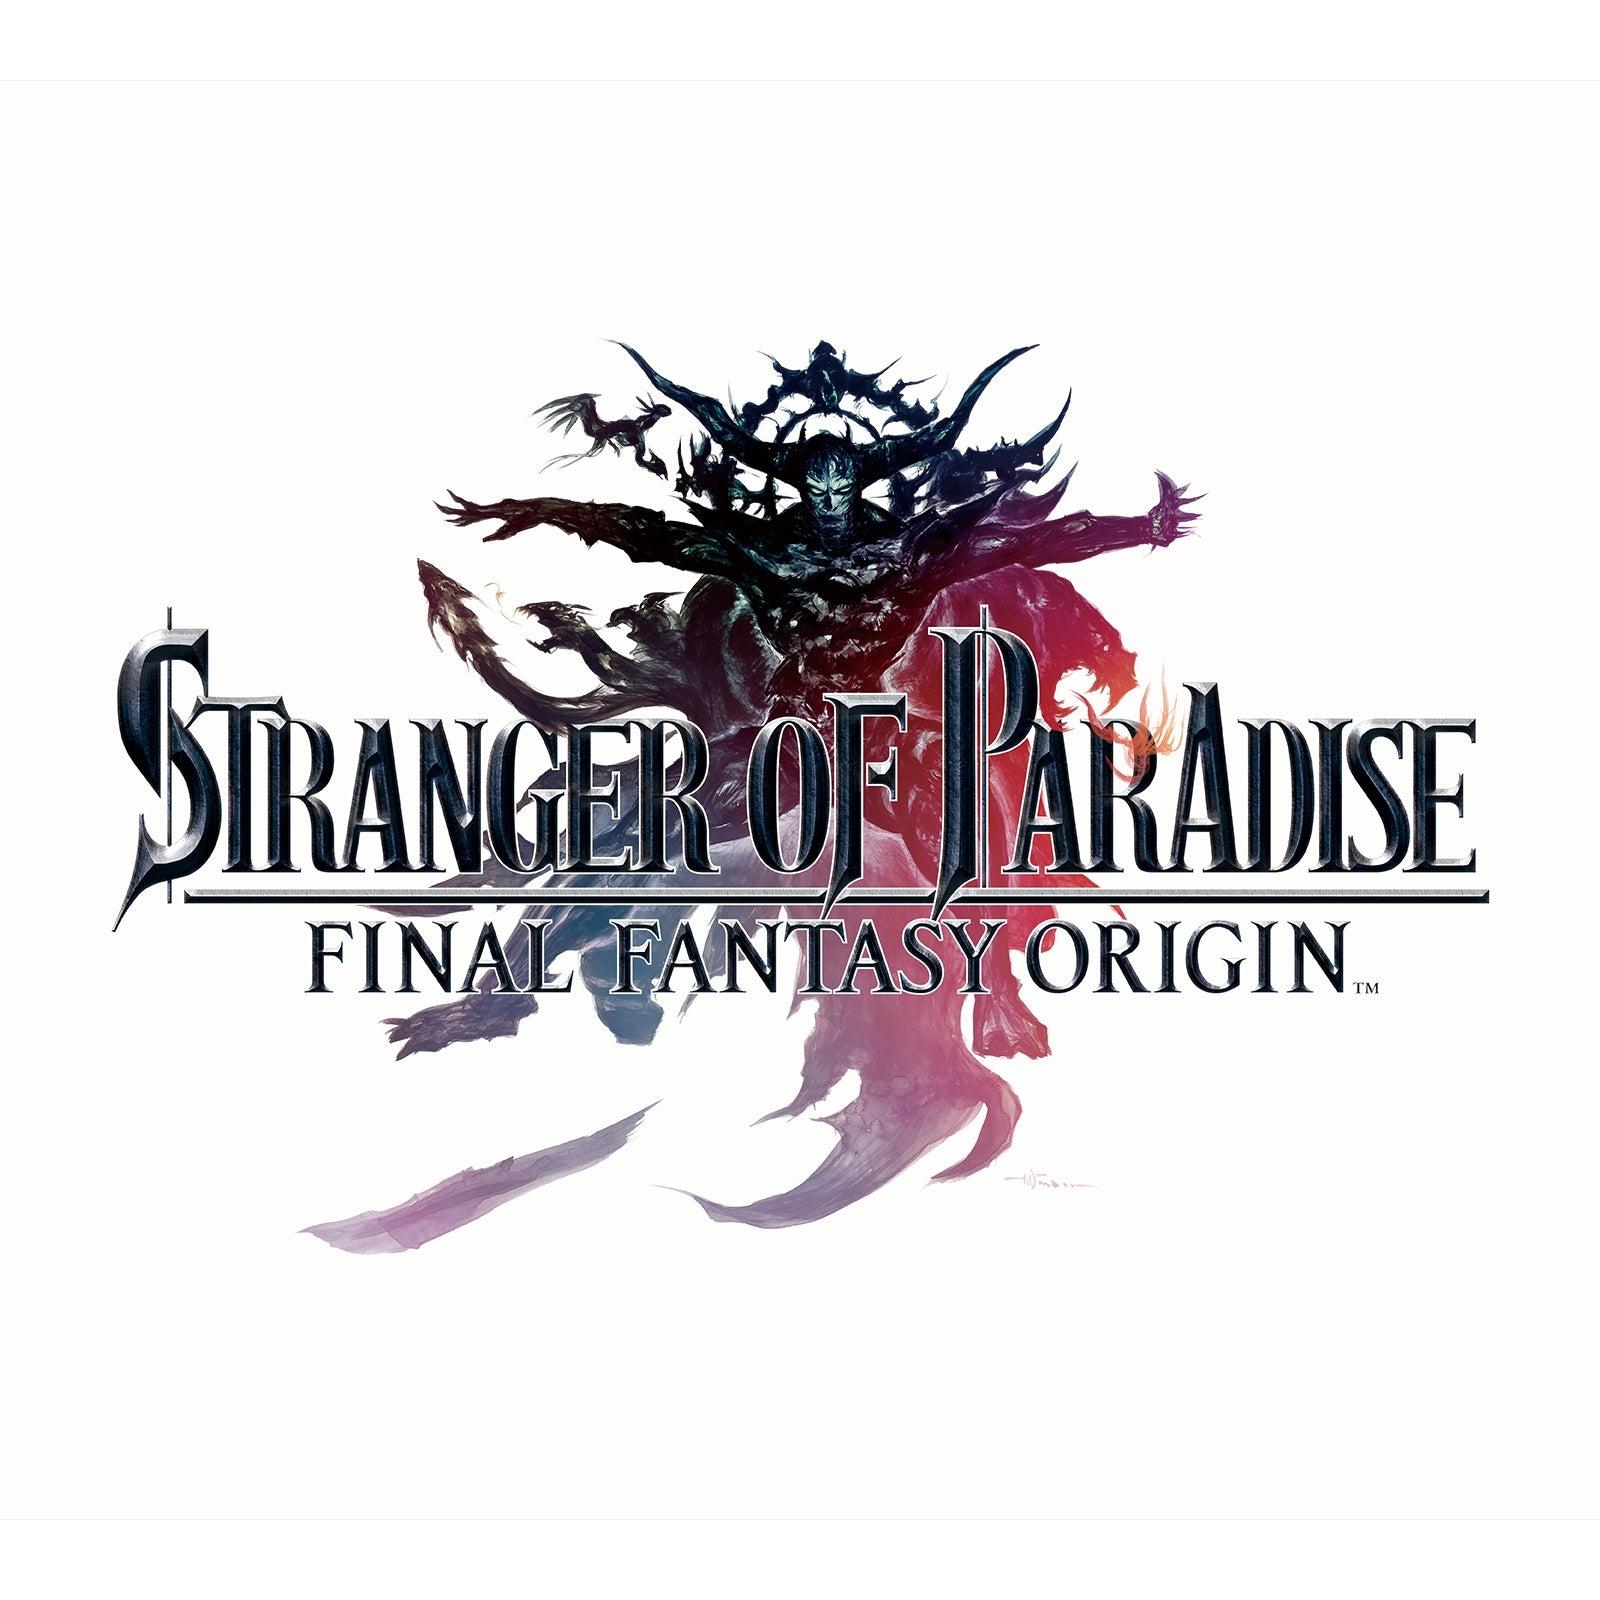 Stranger of Paradise: Final Fantasy Origin est sur jdrpg.fr